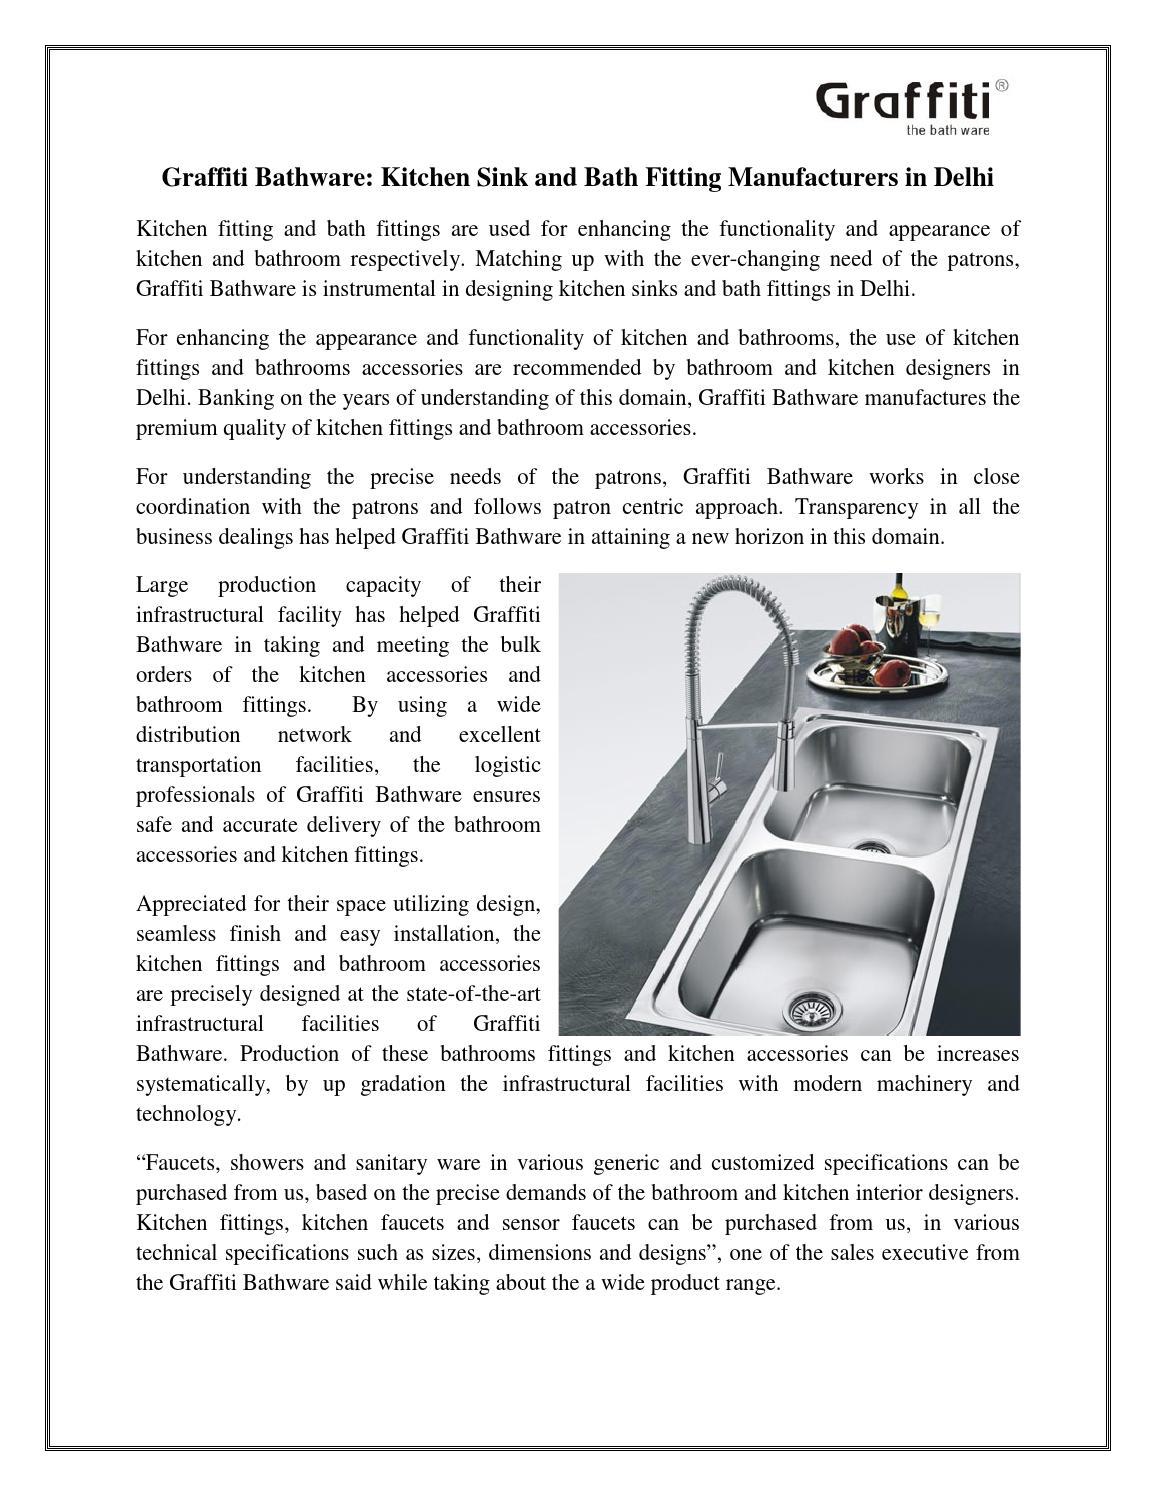 9733598947 Graffiti bathware kitchen sink and bath fitting manufacturers in delhi